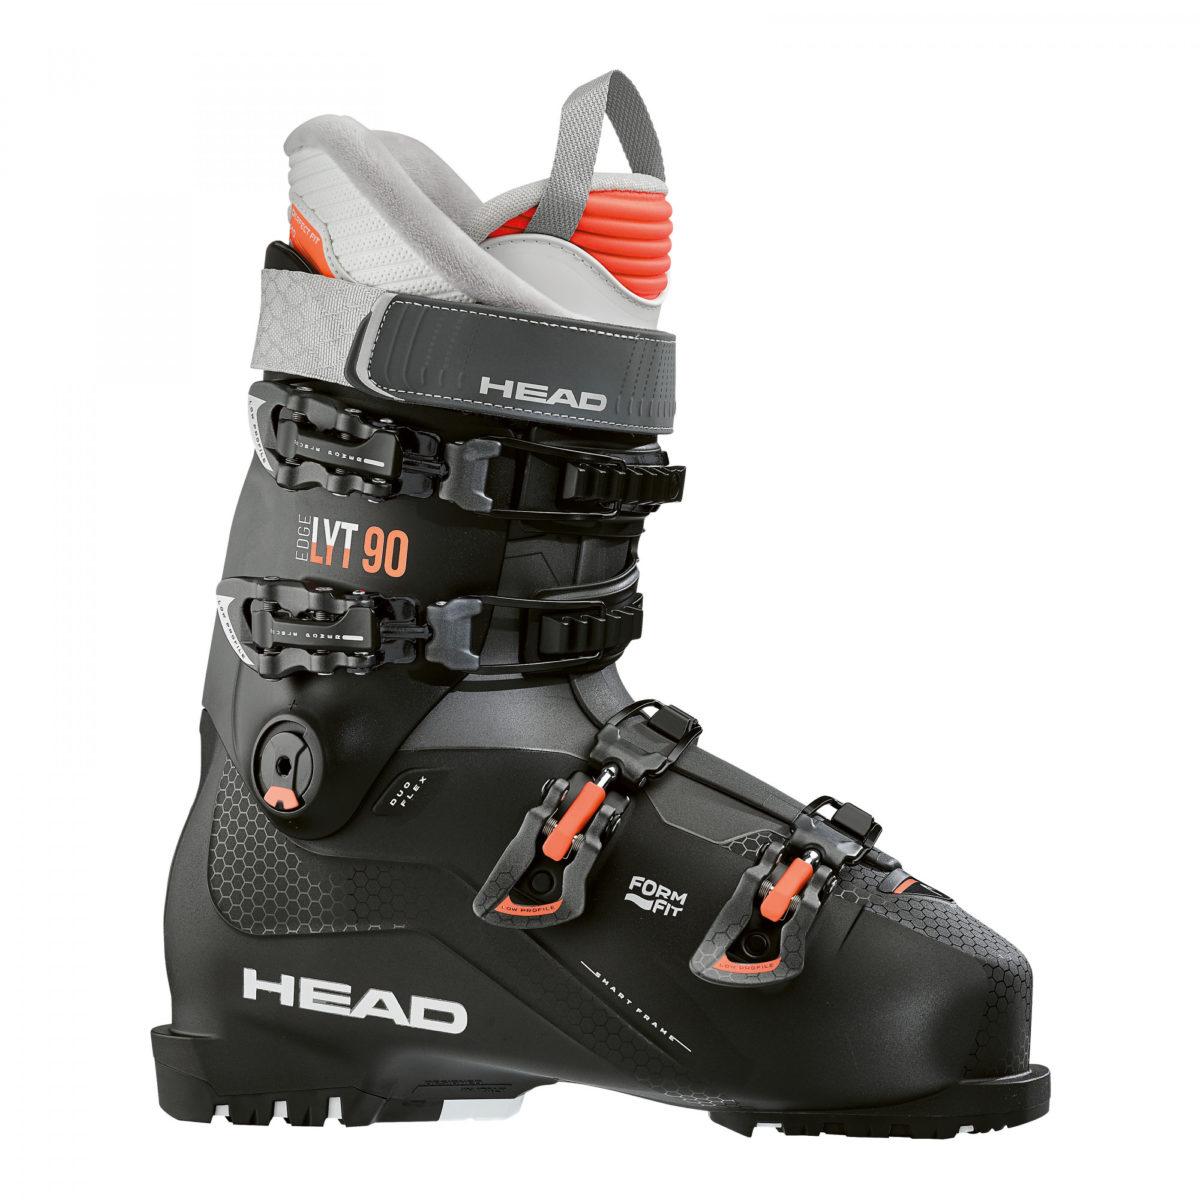 HEAD EDGE LYT 90 W Ботинки горнолыжные 609218 - 1